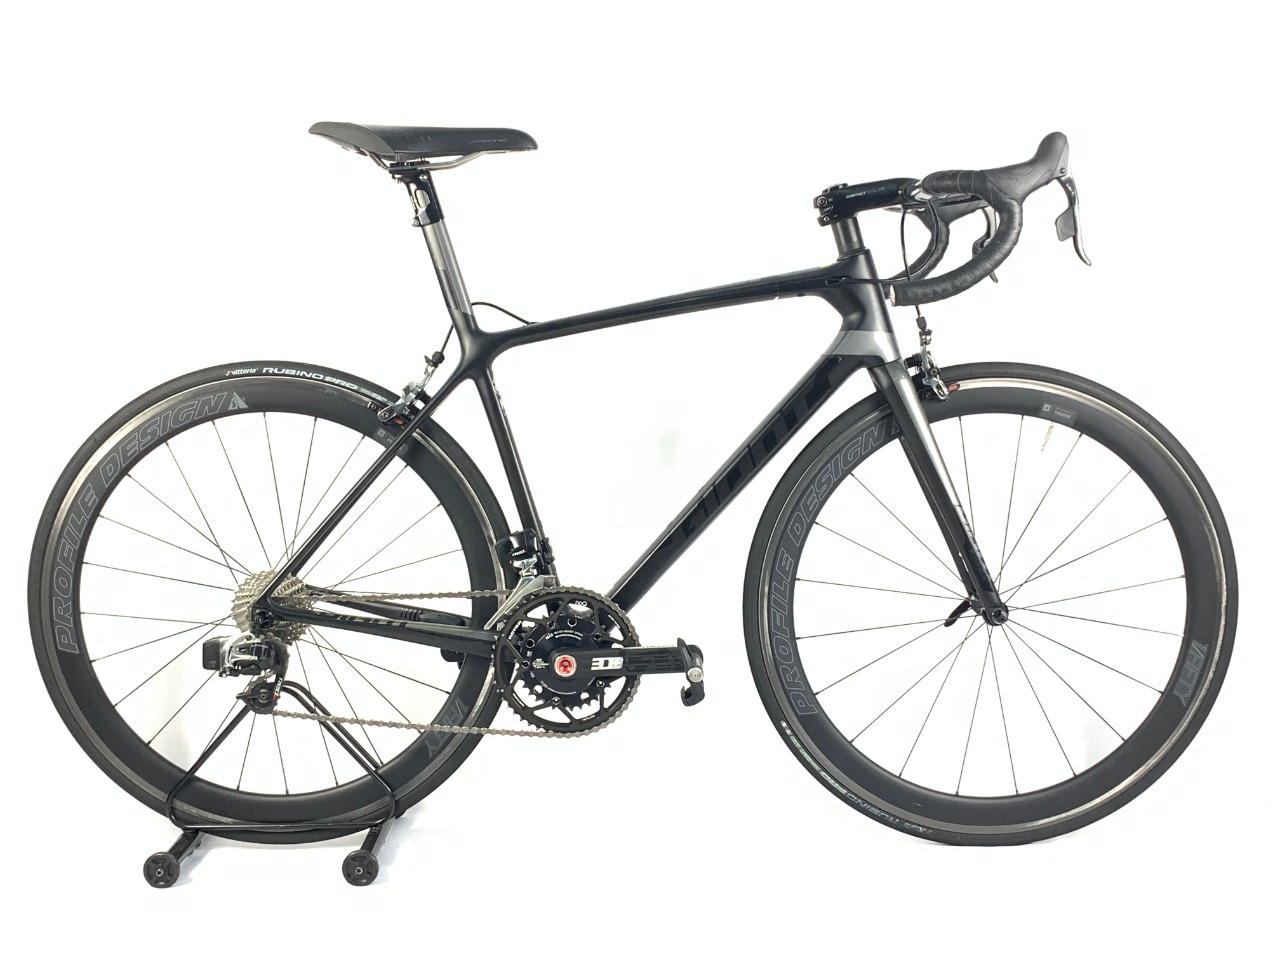 Bicicleta Speed Giant Tcr Advanced Sl Tamanho M Seminovo